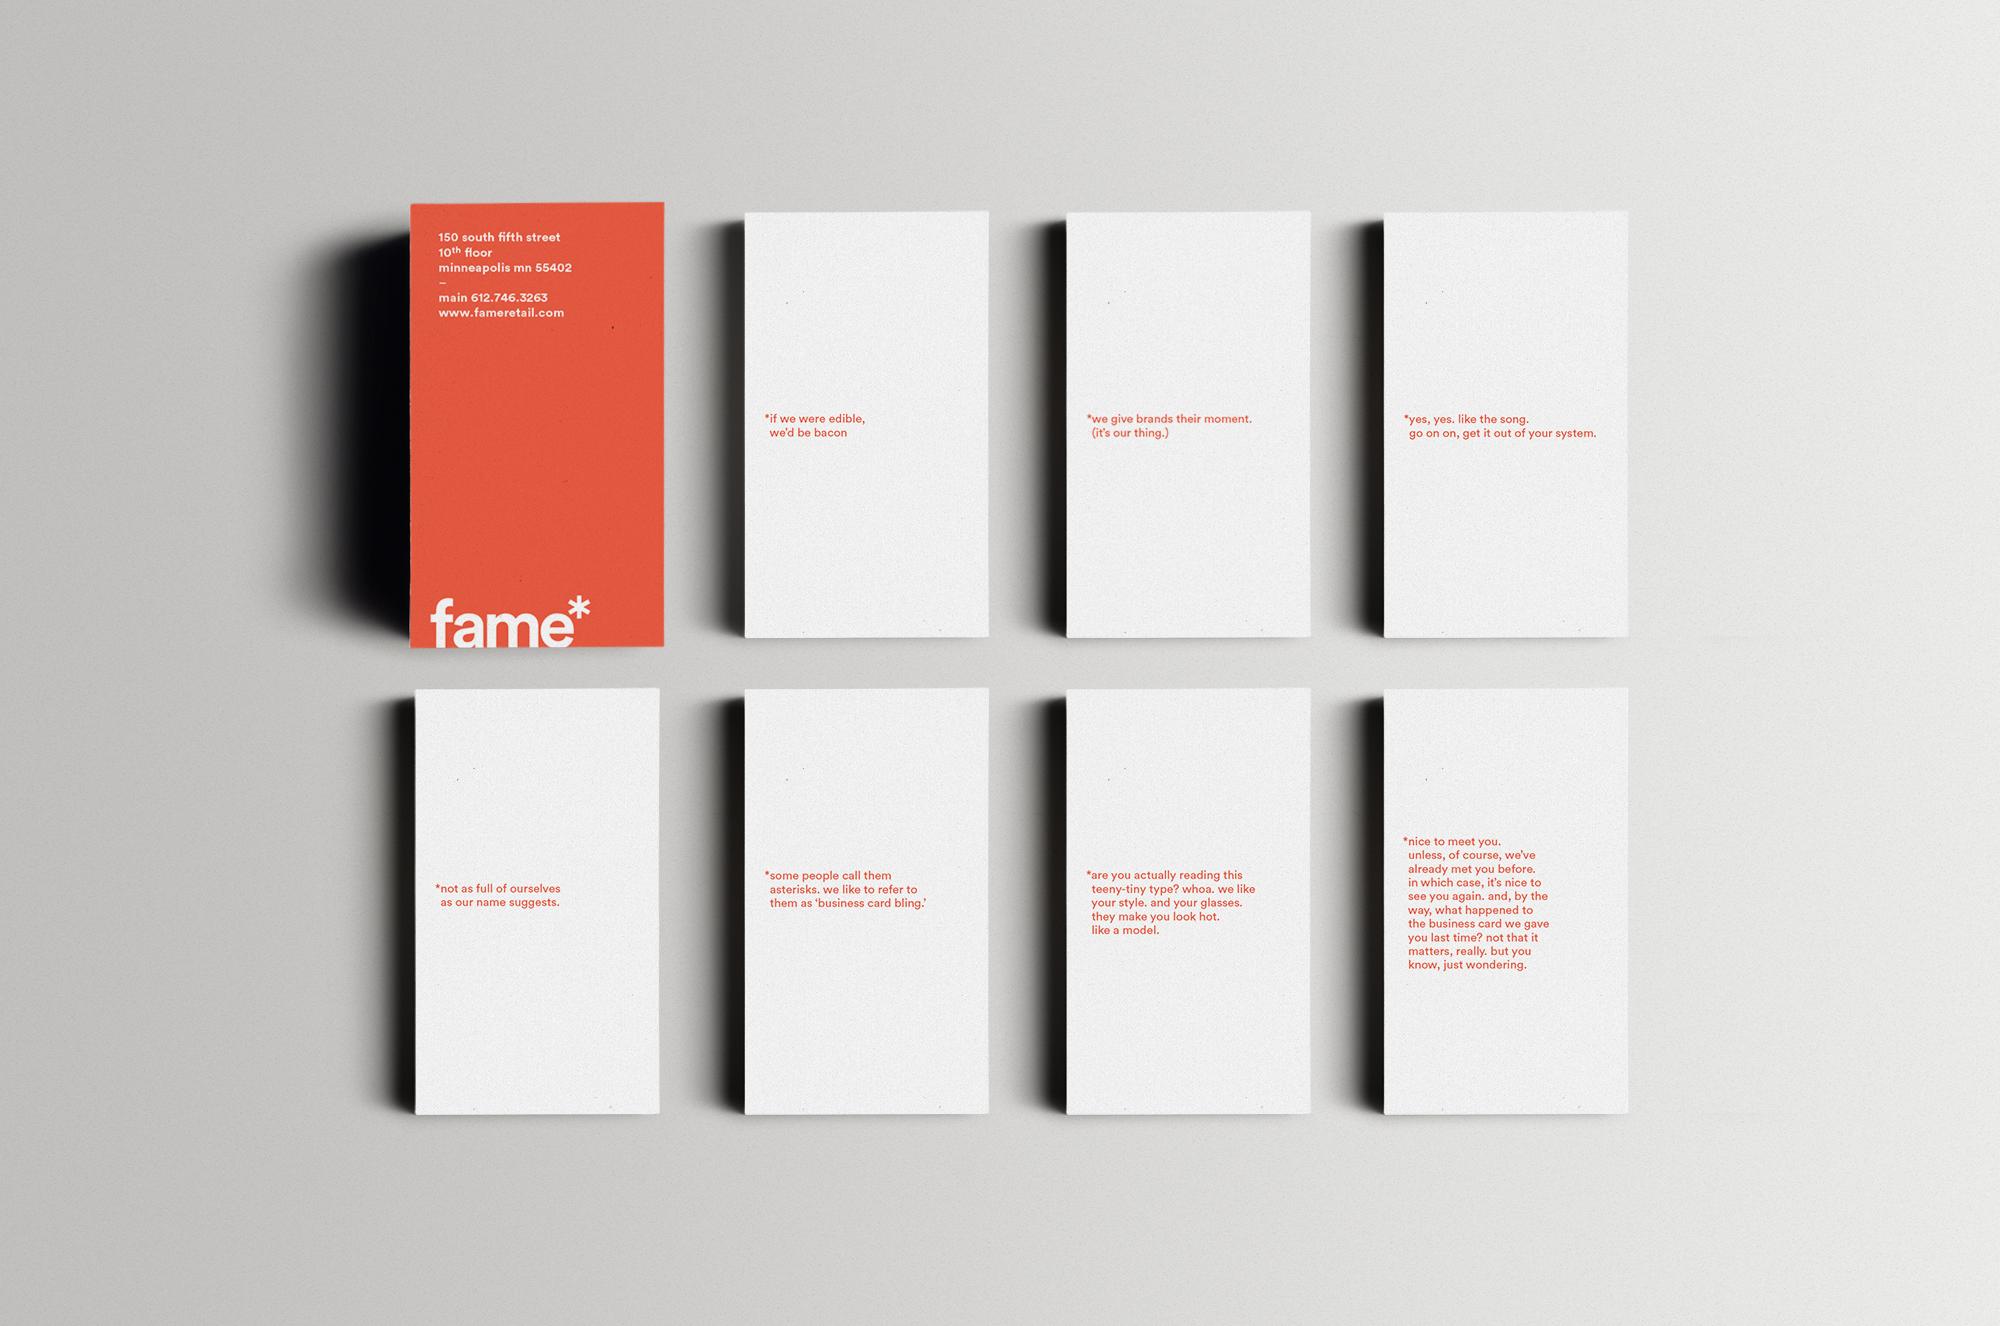 Fame Retail - Gustav Holtz